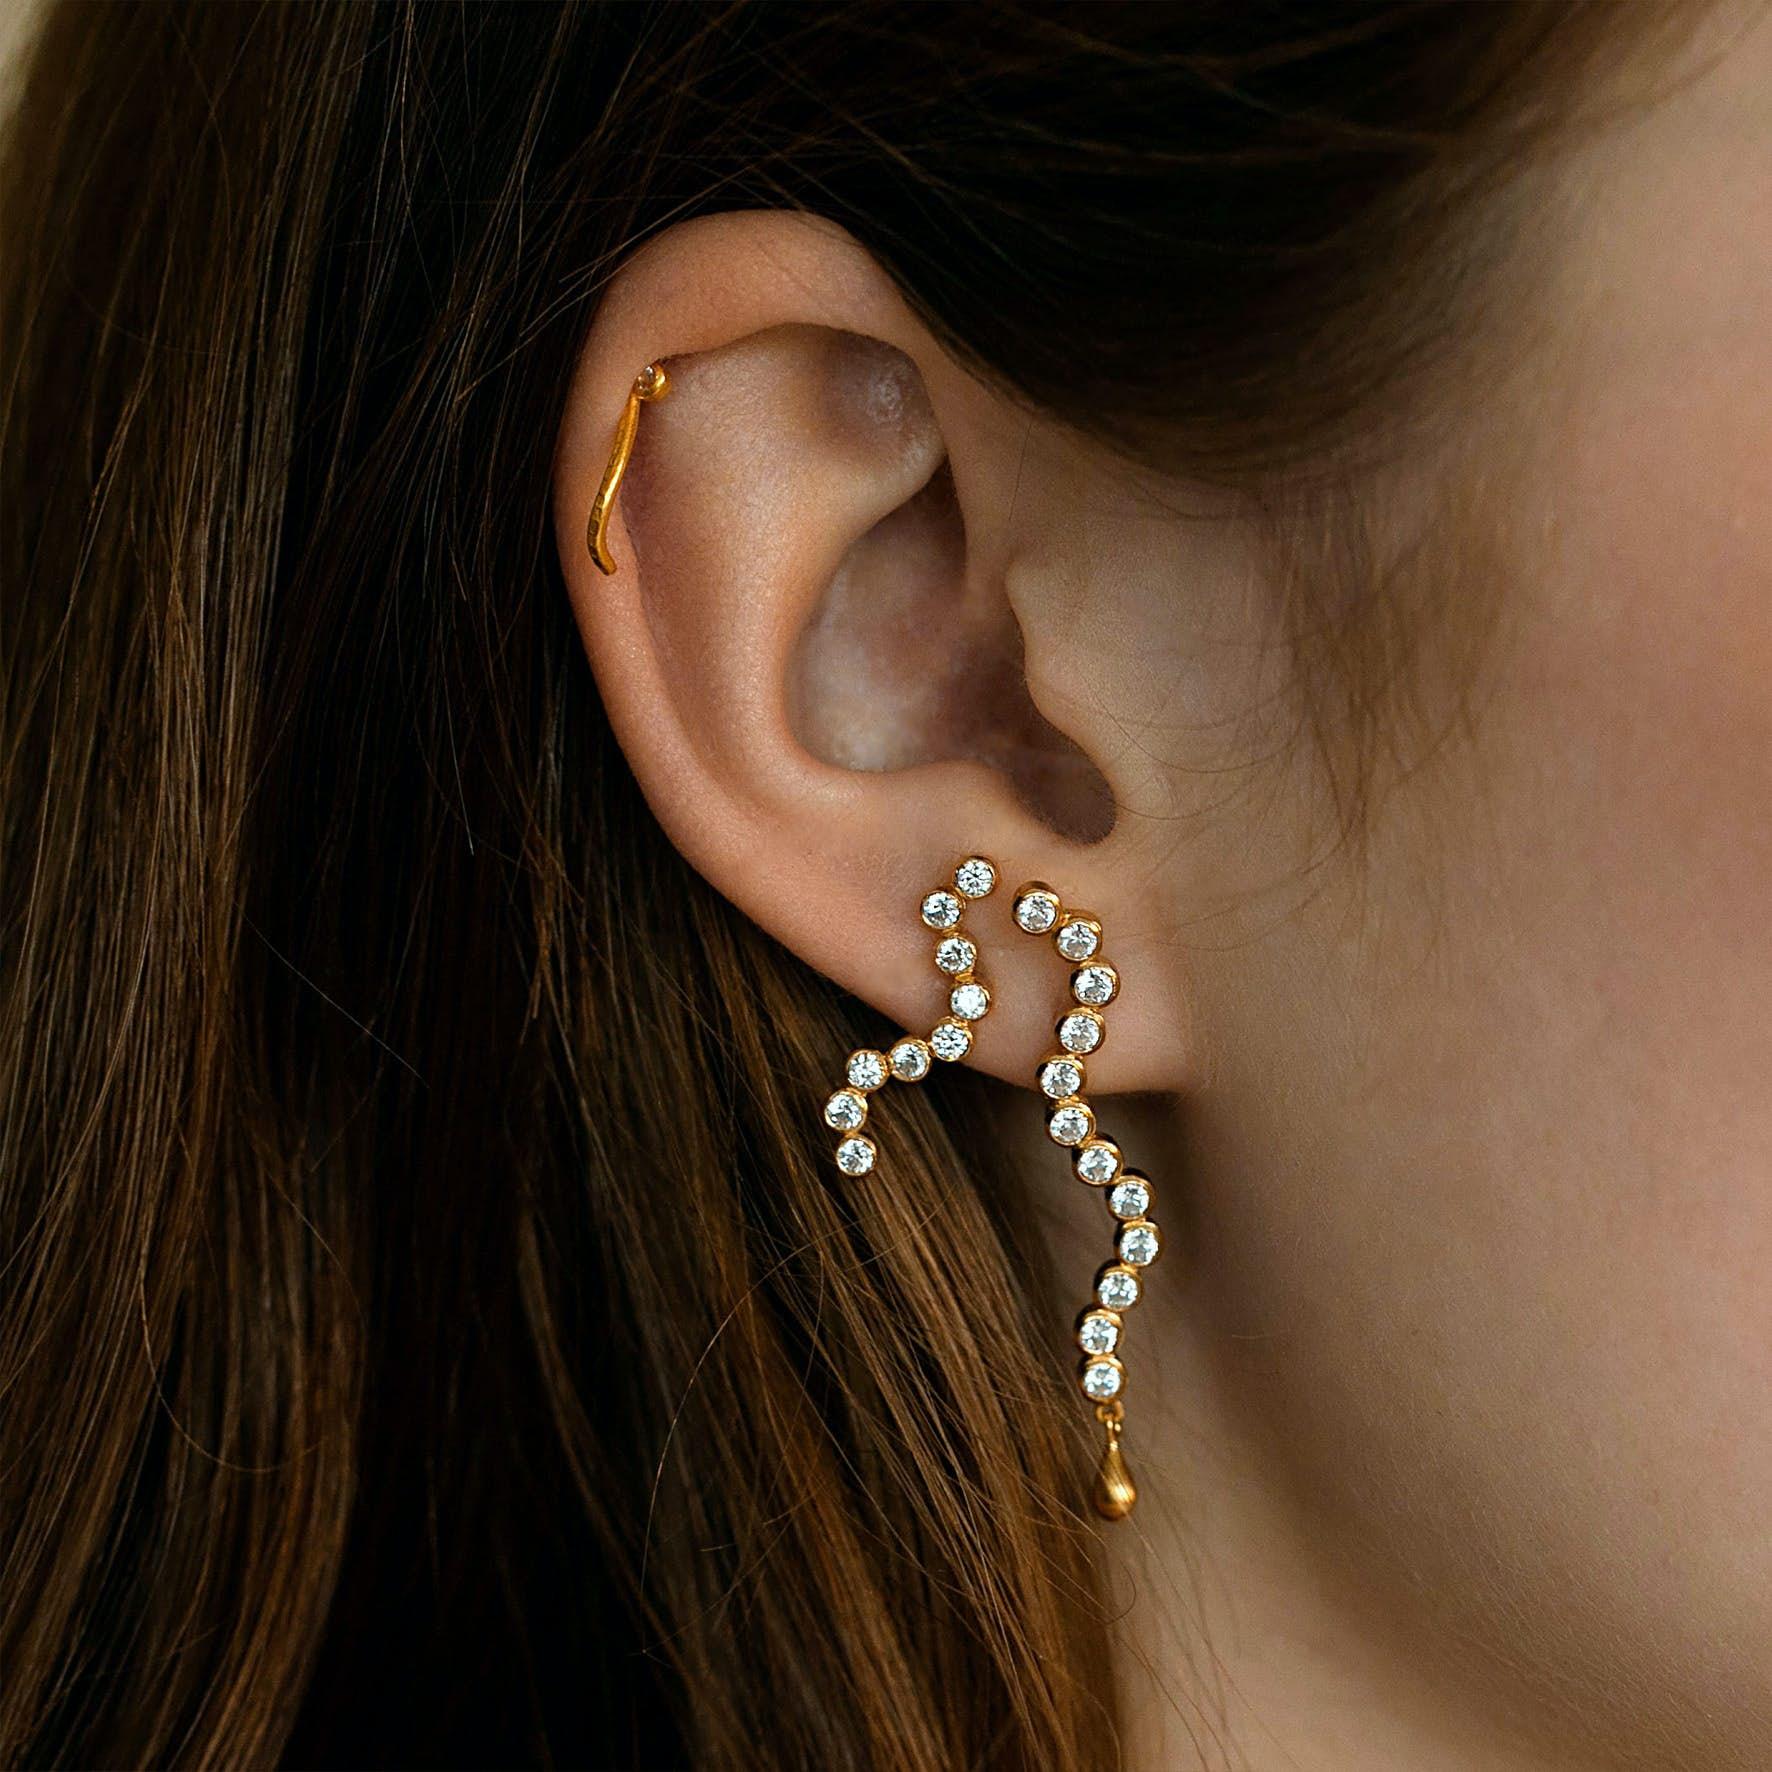 Midnight Sparkle Long Earring- Left fra STINE A Jewelry i Forgyldt-Sølv Sterling 925